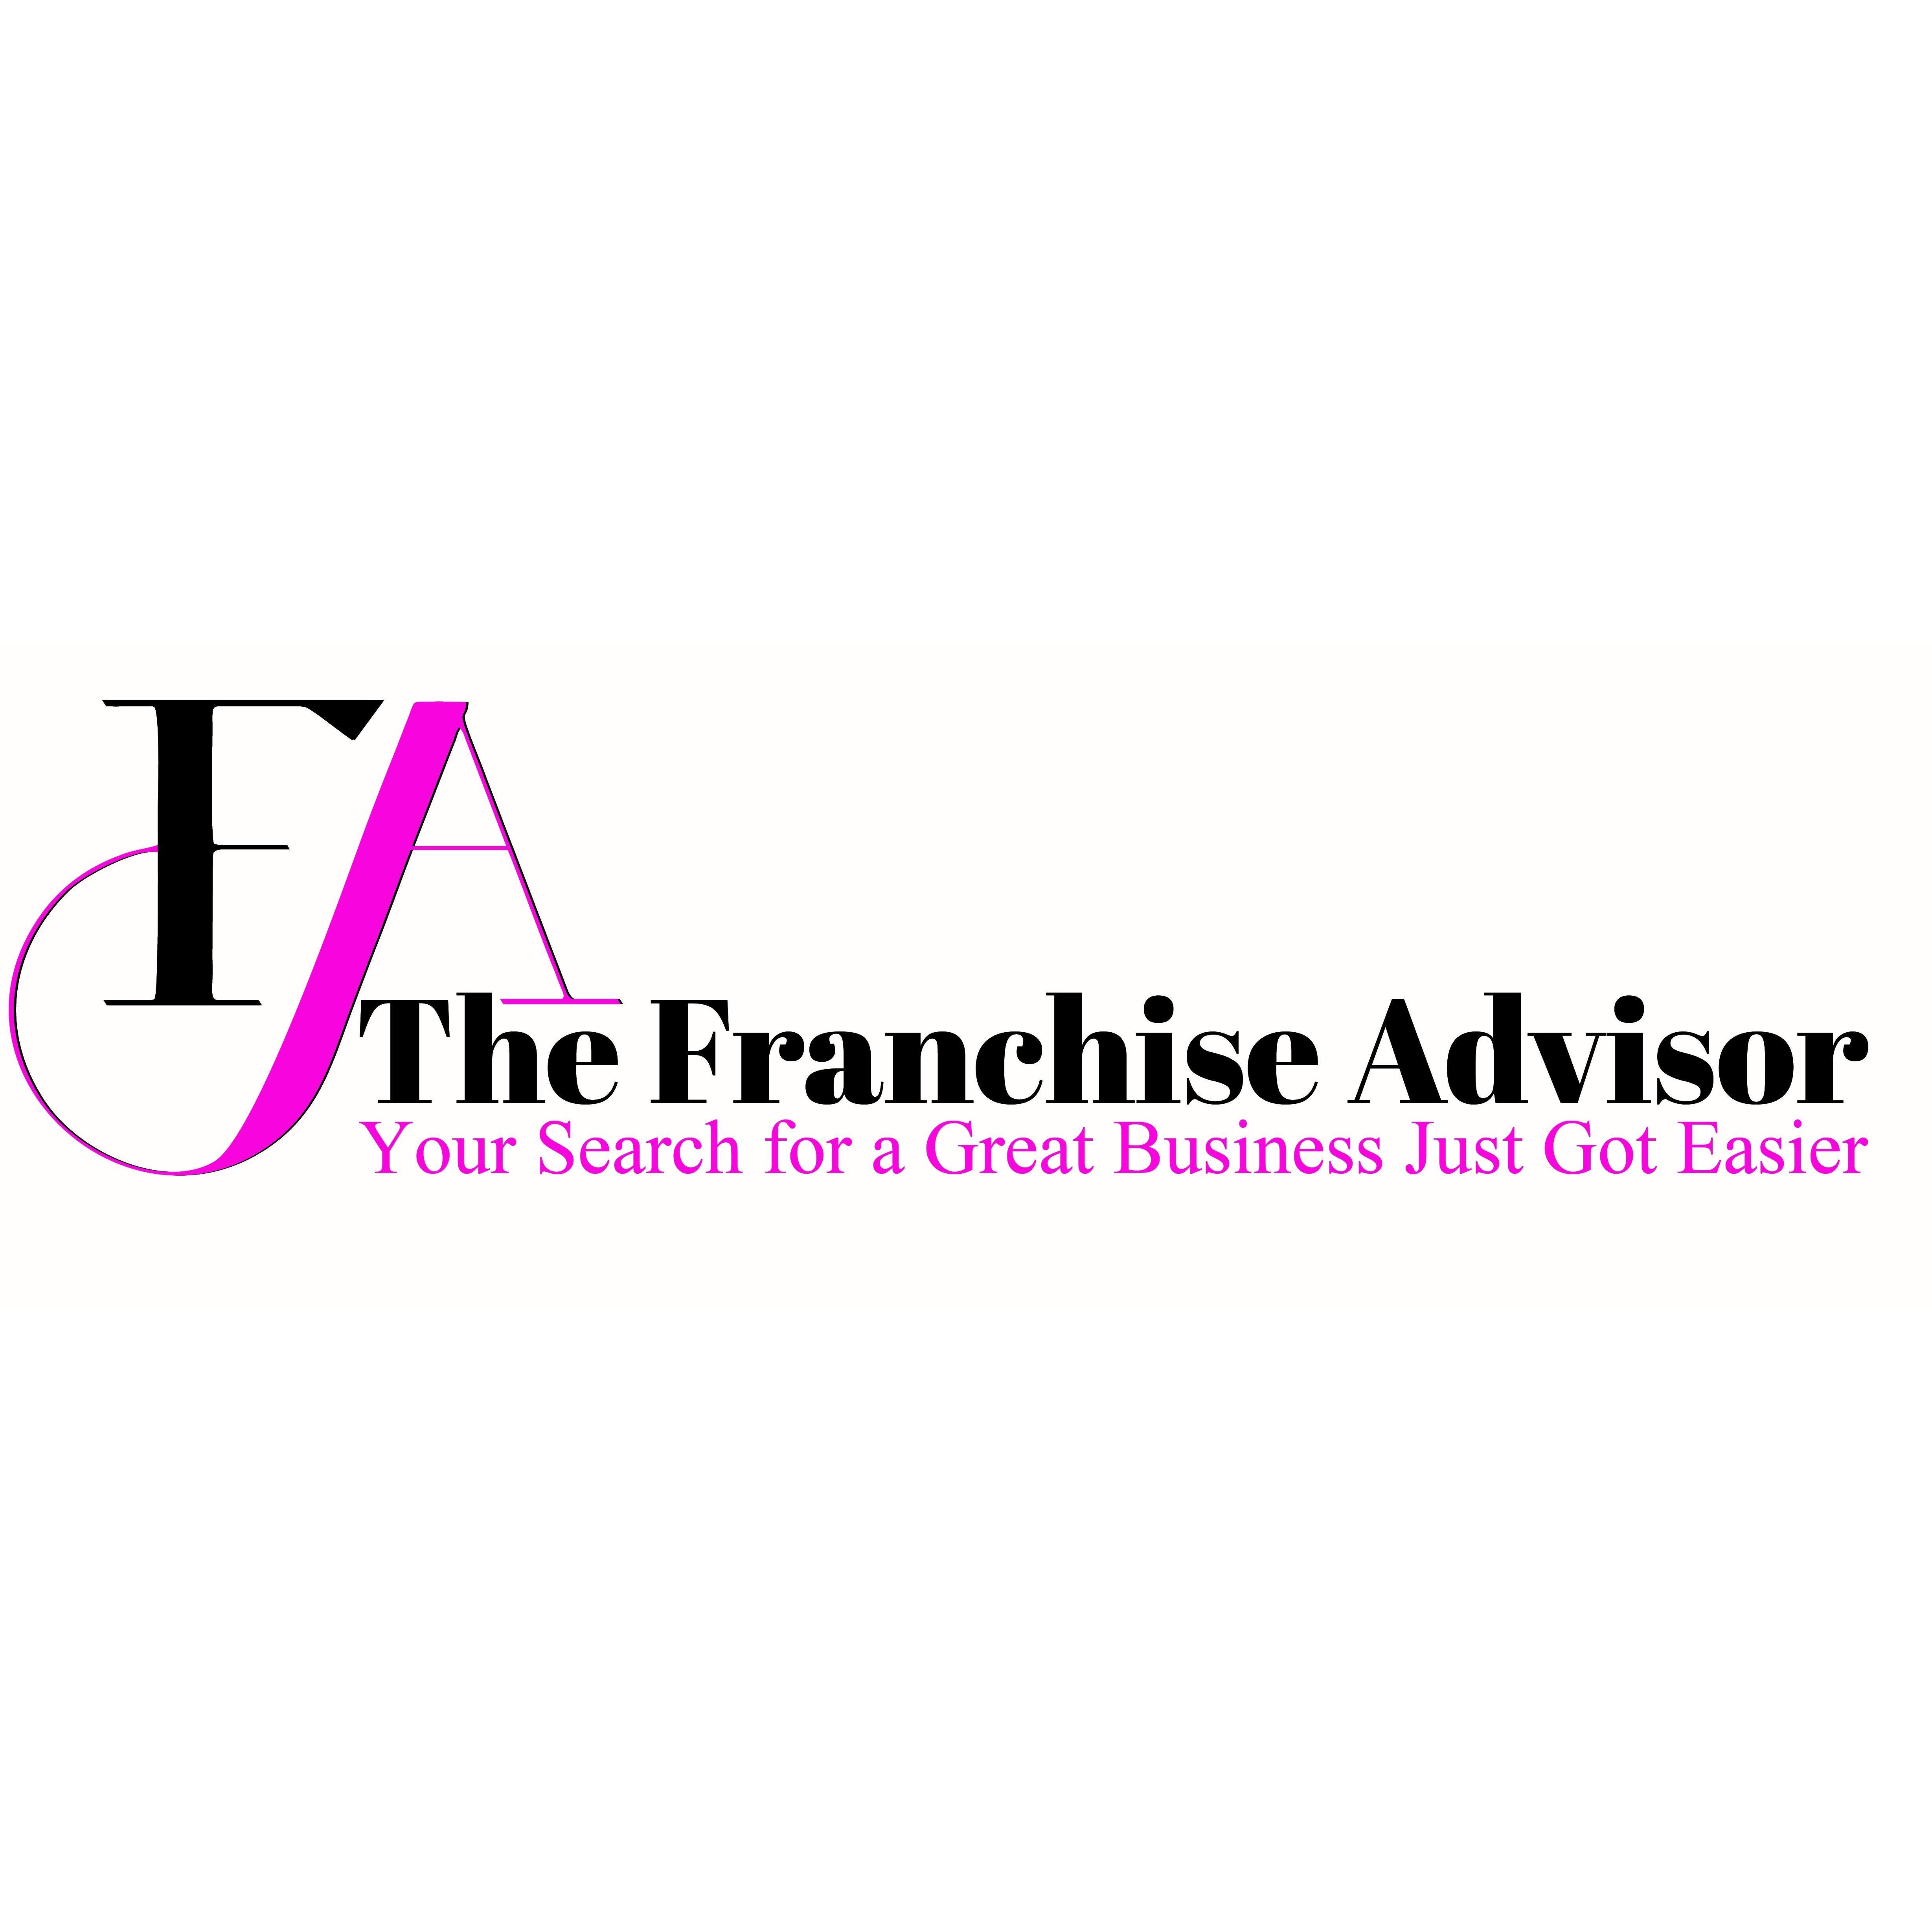 The Franchise Advisor - New York, NY 10018 - (877)220-4214 | ShowMeLocal.com